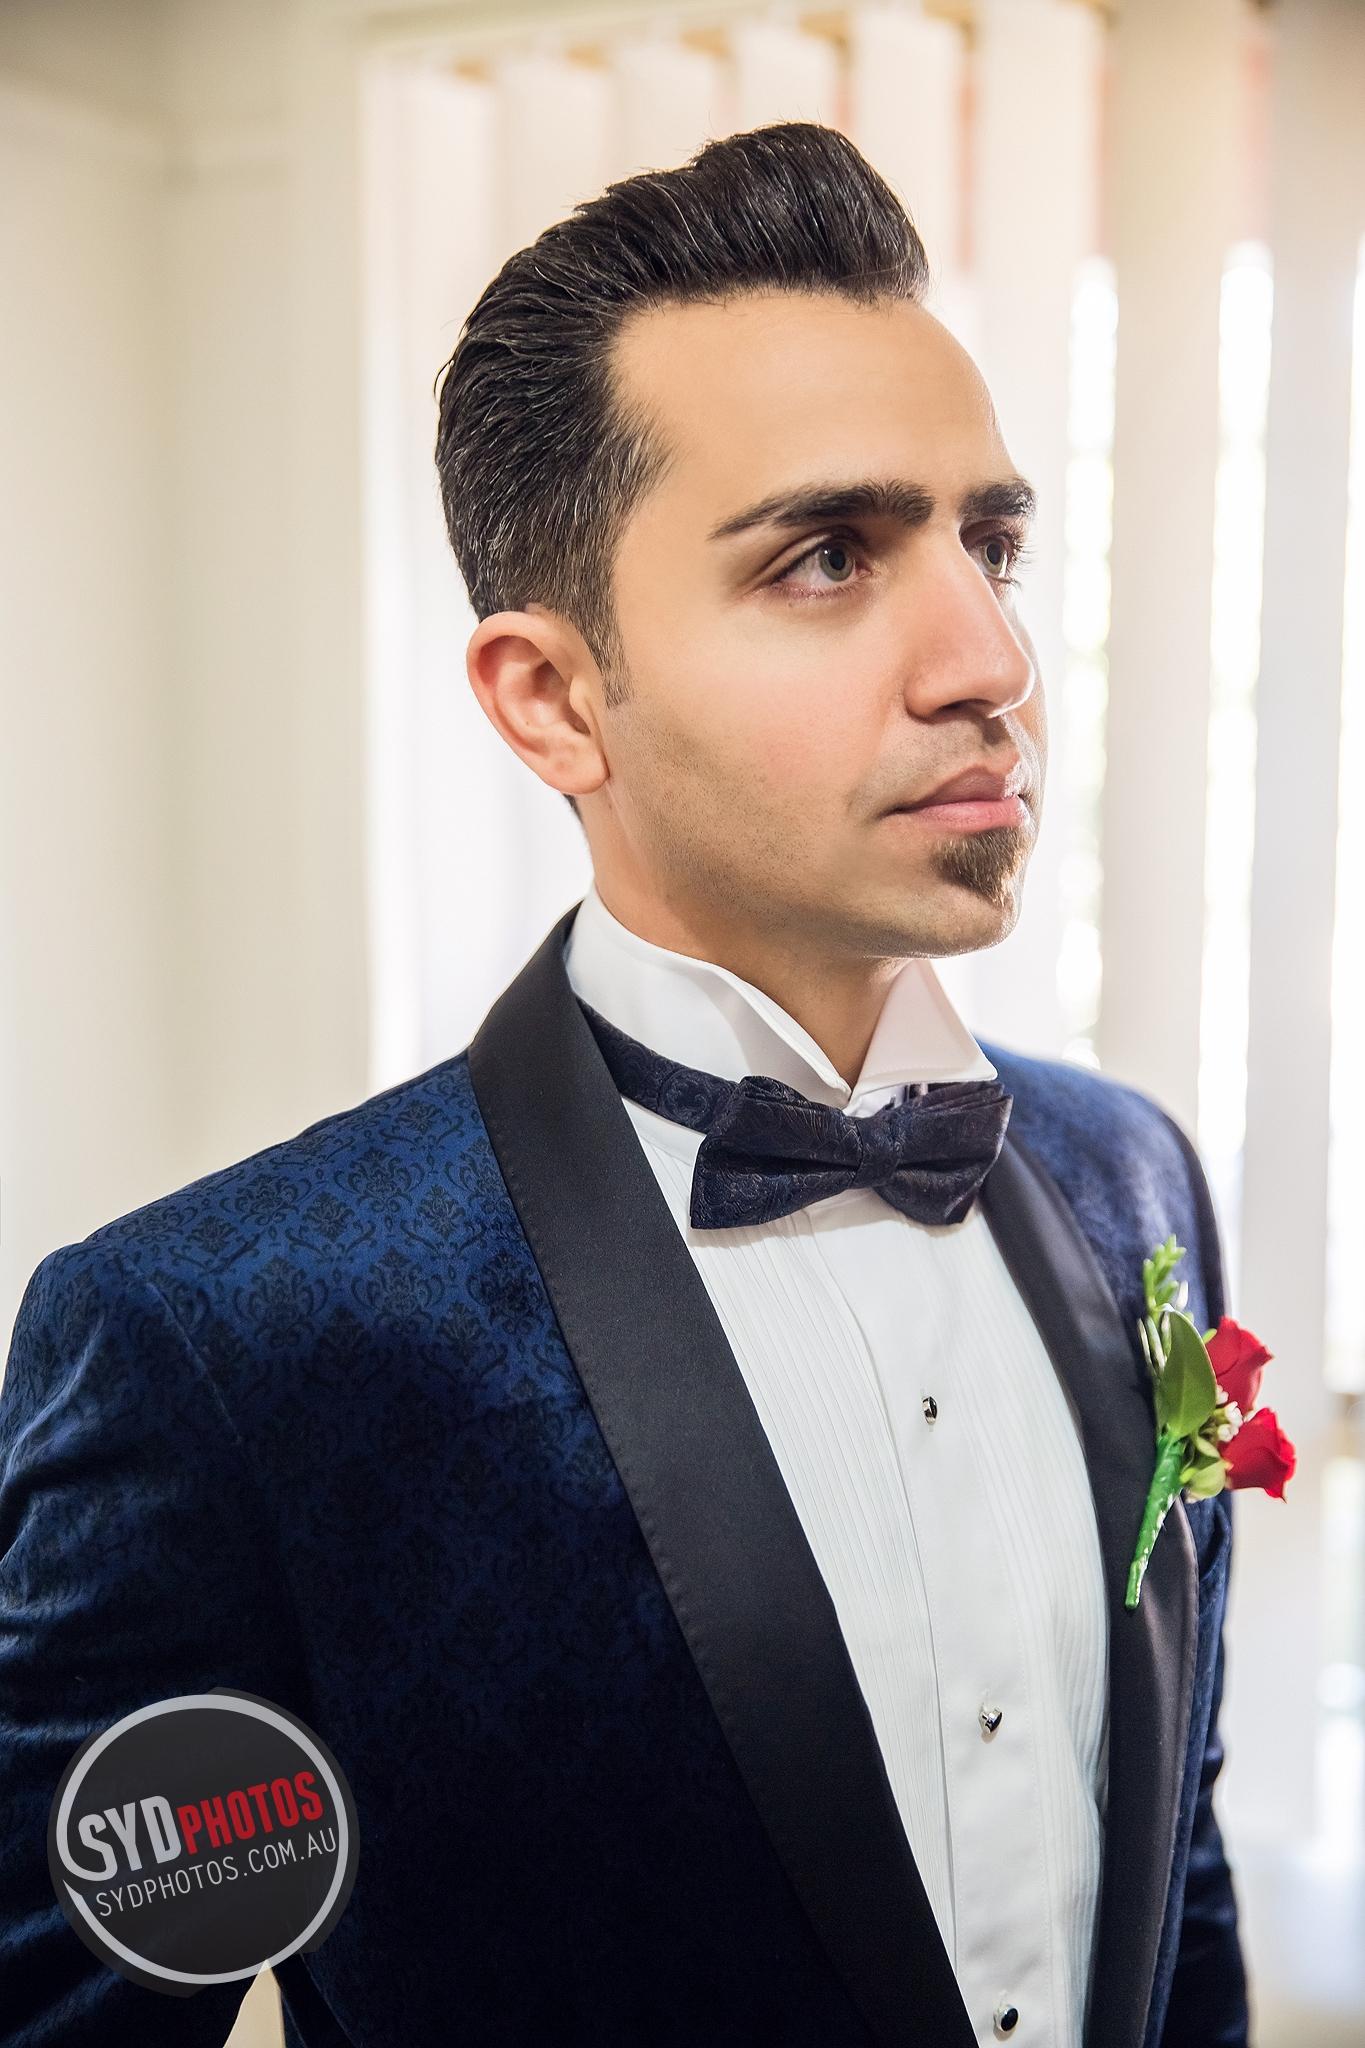 ID-84902-Mansour-Wedding-悉尼婚礼摄影